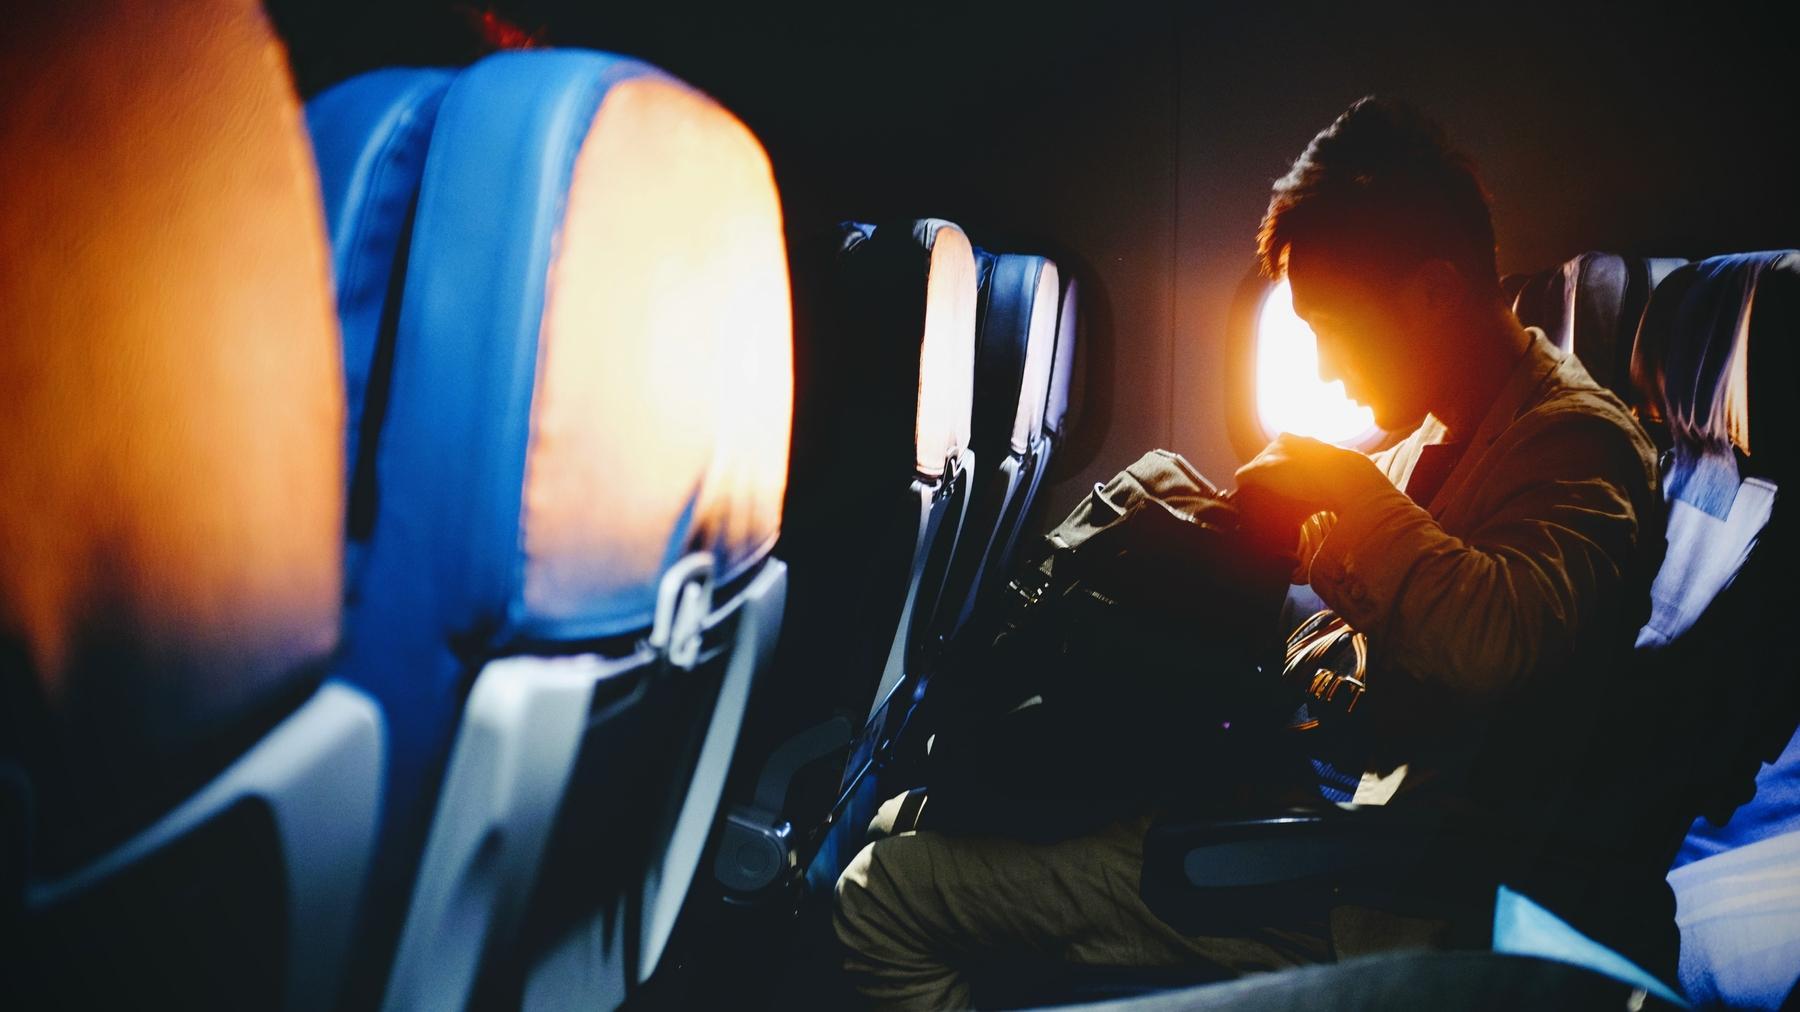 Man on board a plane checks his back